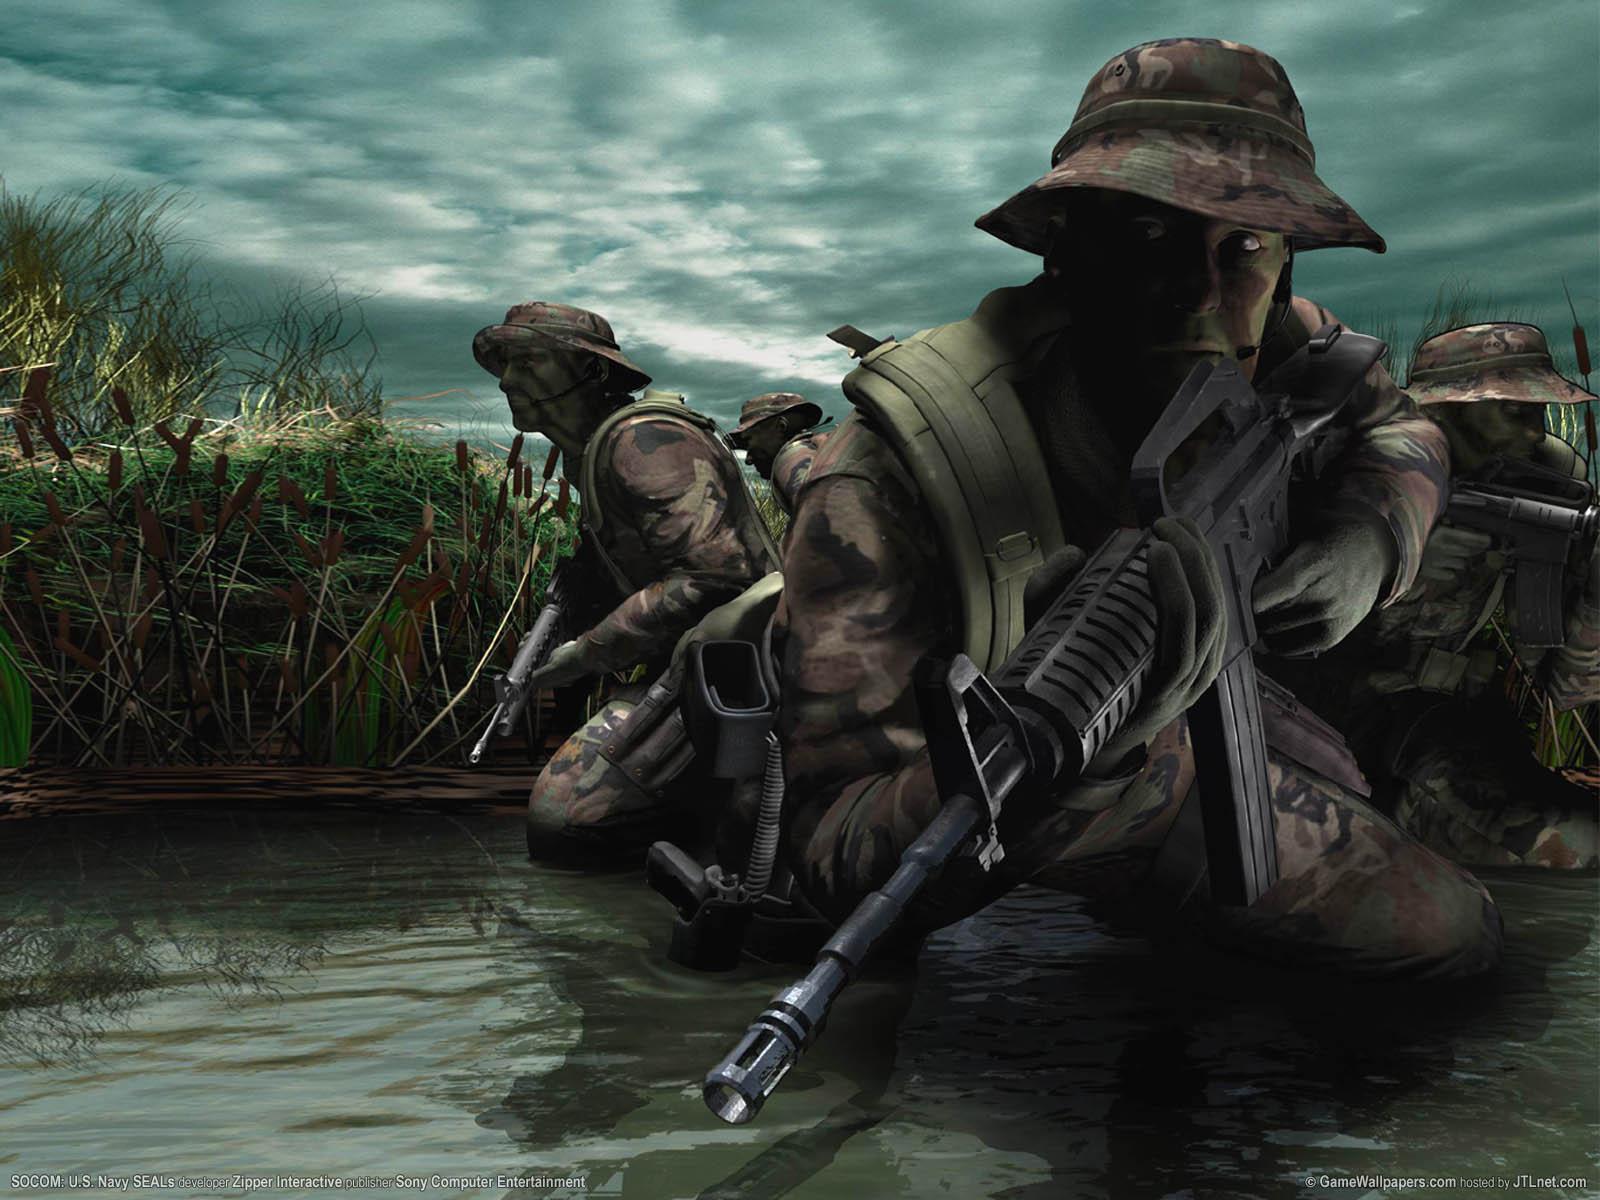 SOCOM: U.S. Navy SEALs Hintergrundbild 02 1600x1200